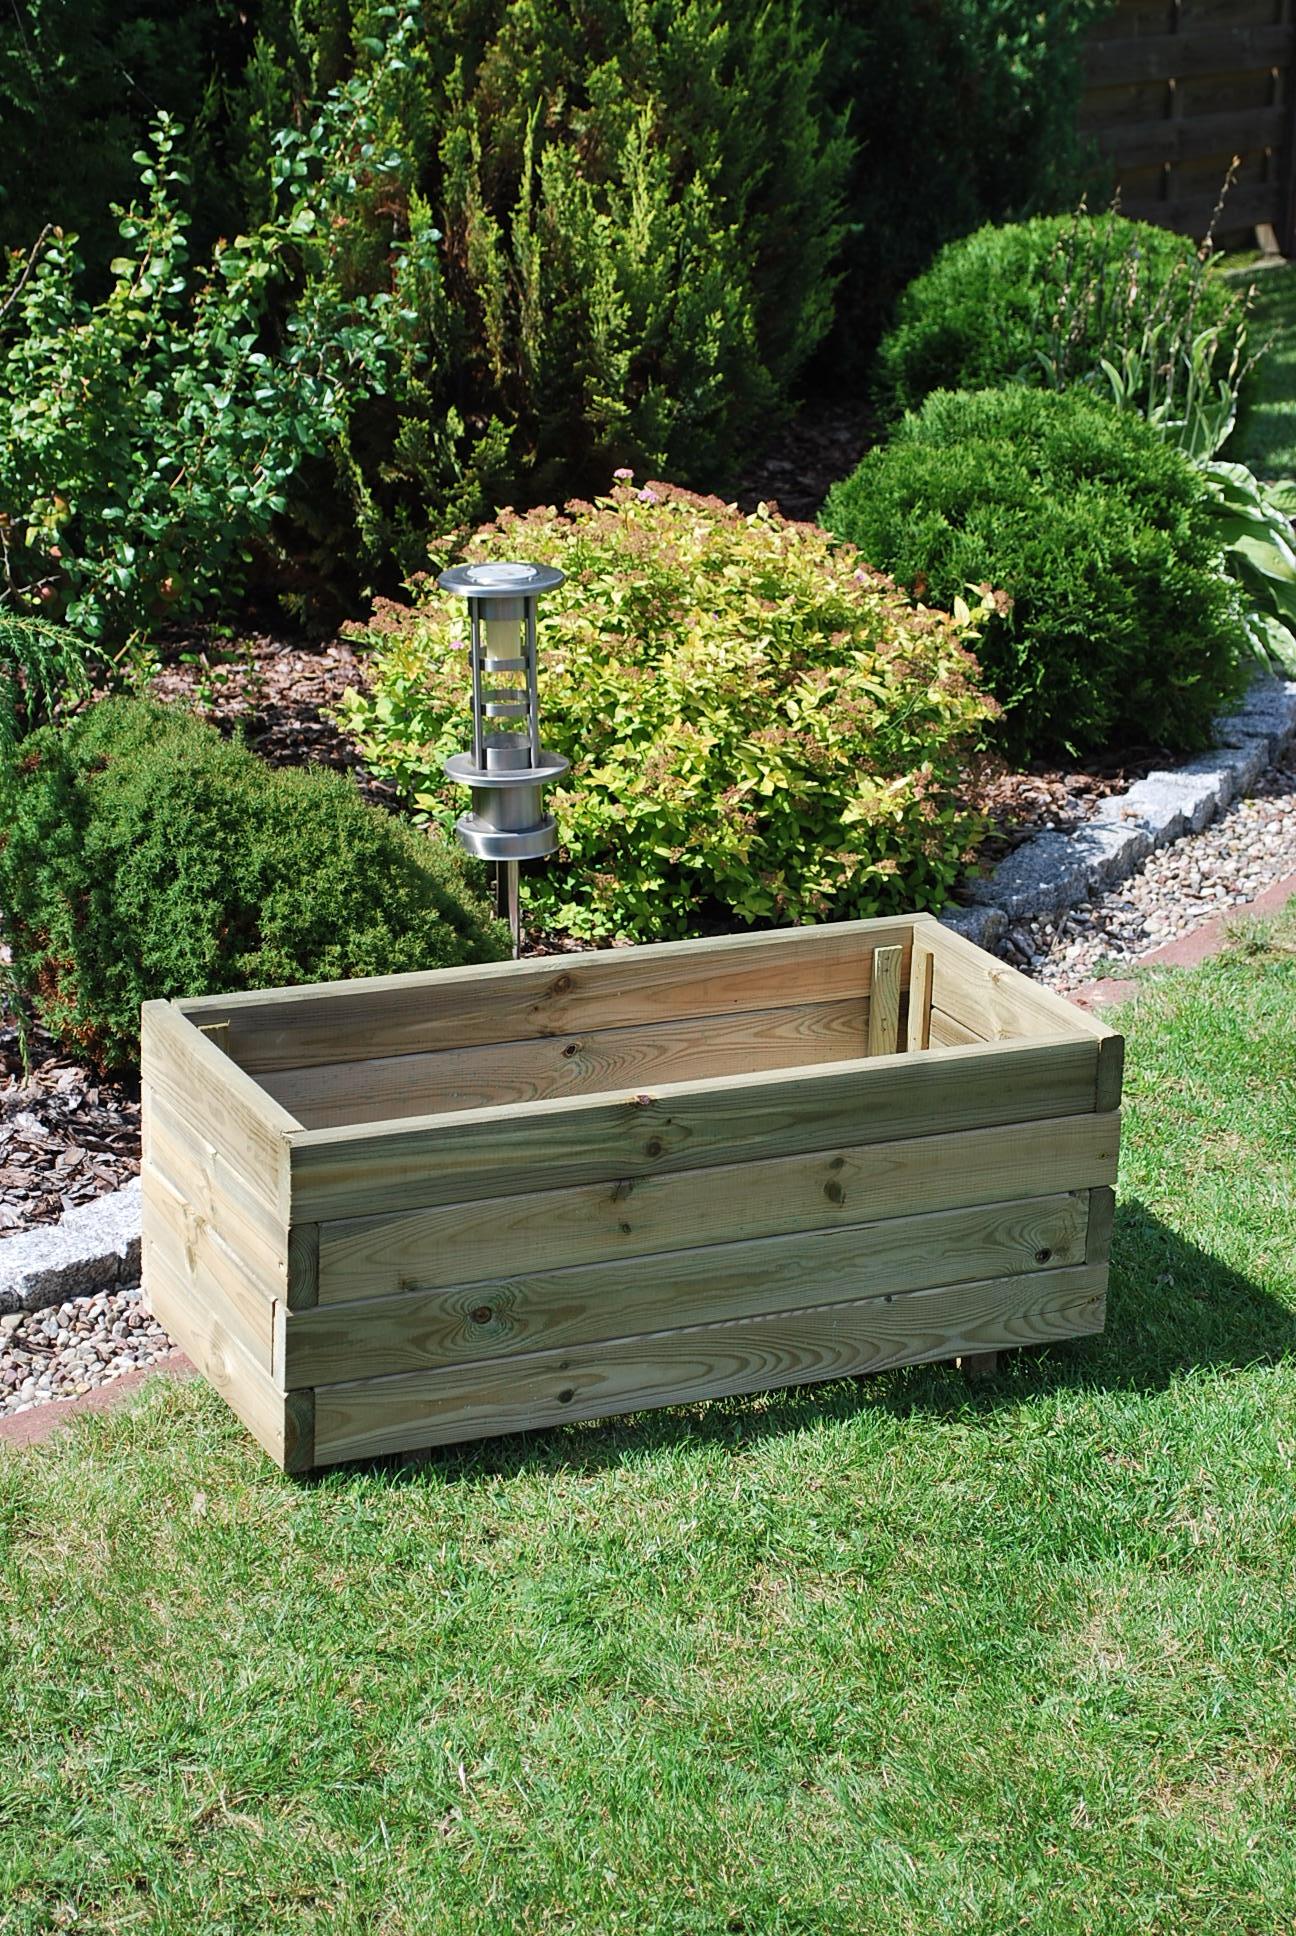 161. NORFOLK rectangular medium planter 750x350x305 made from 25 x 70 elements